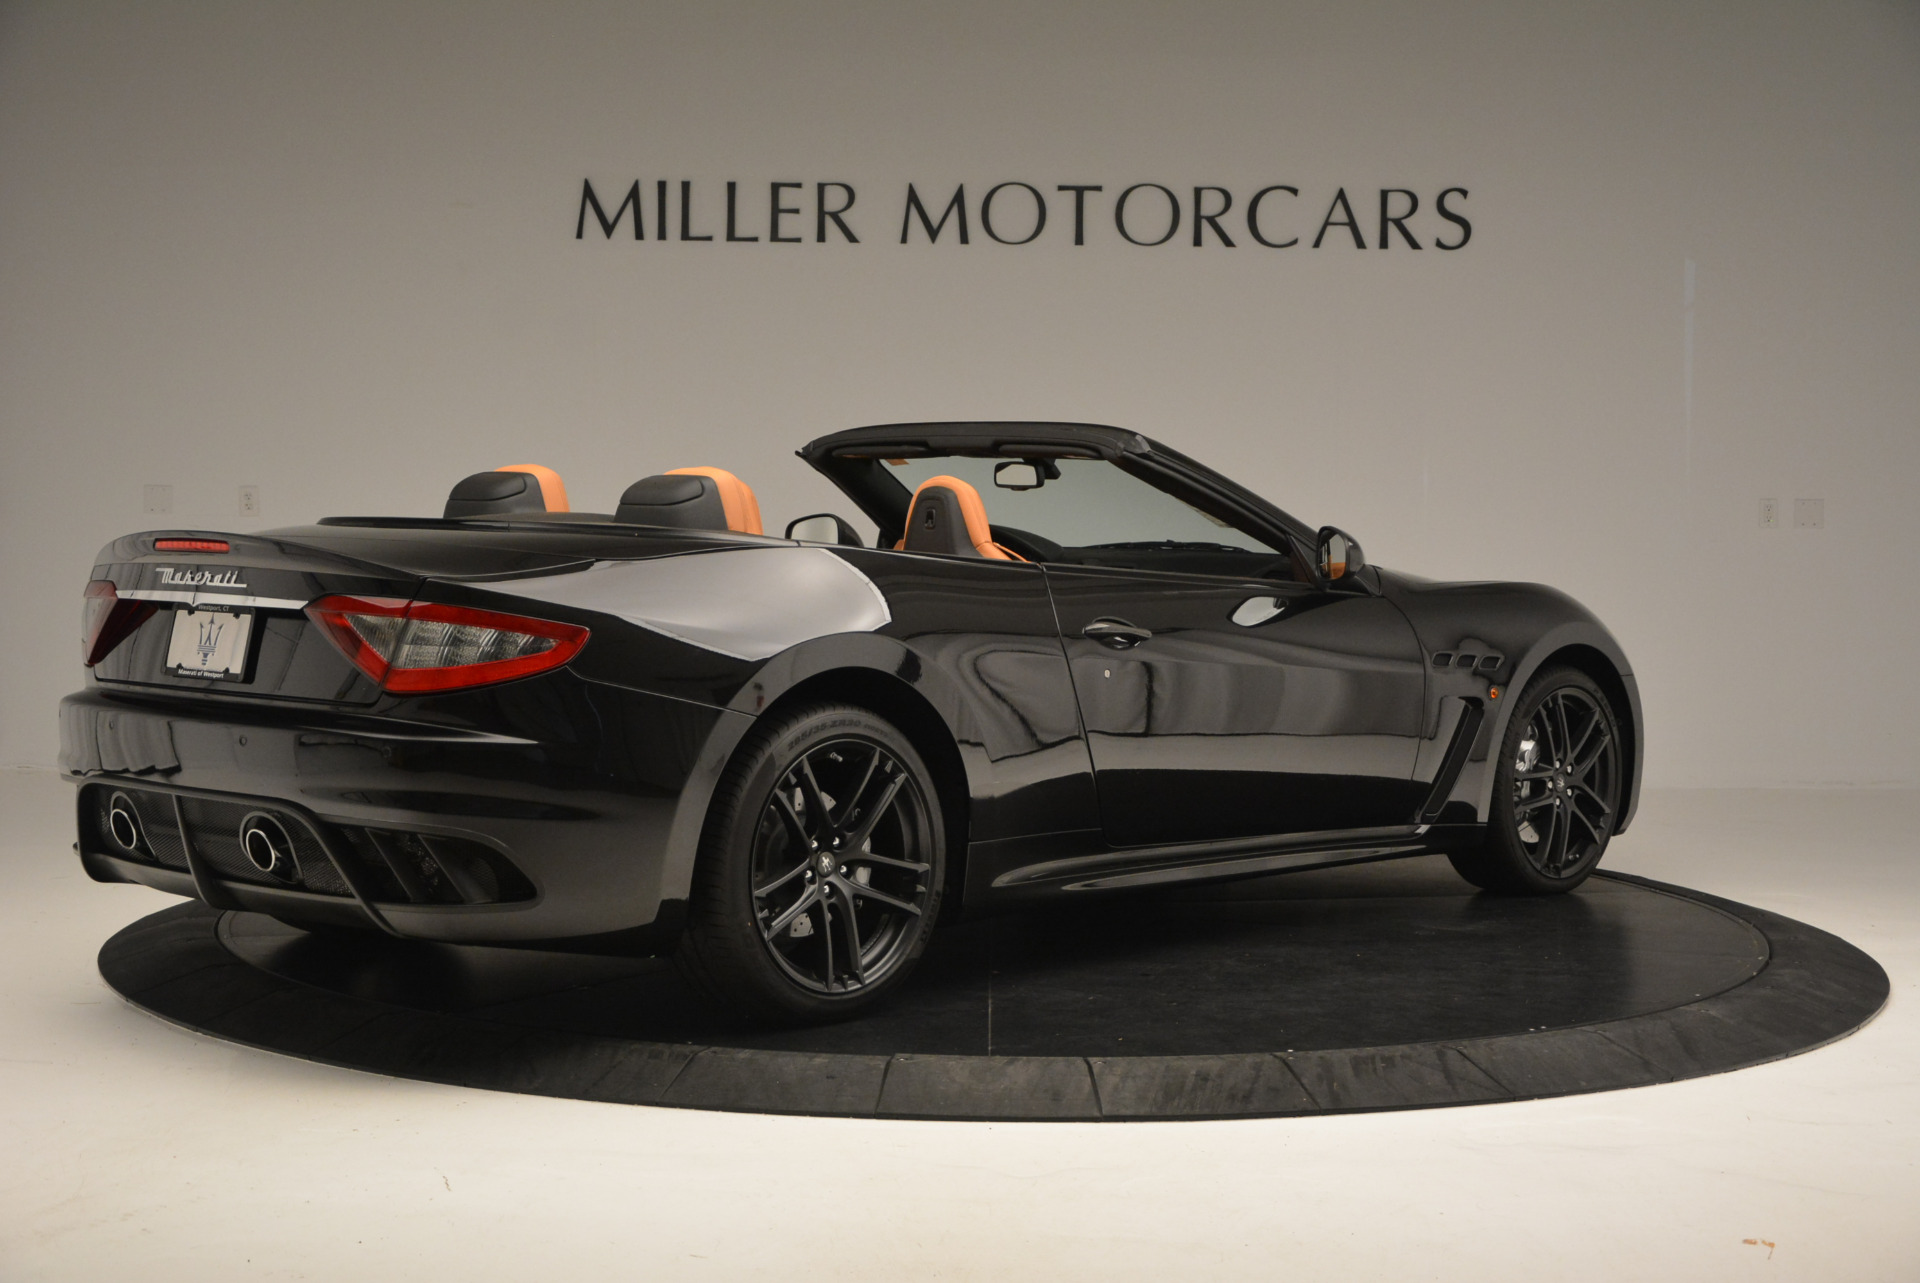 New 2017 Maserati GranTurismo MC CONVERTIBLE For Sale In Westport, CT 596_p8